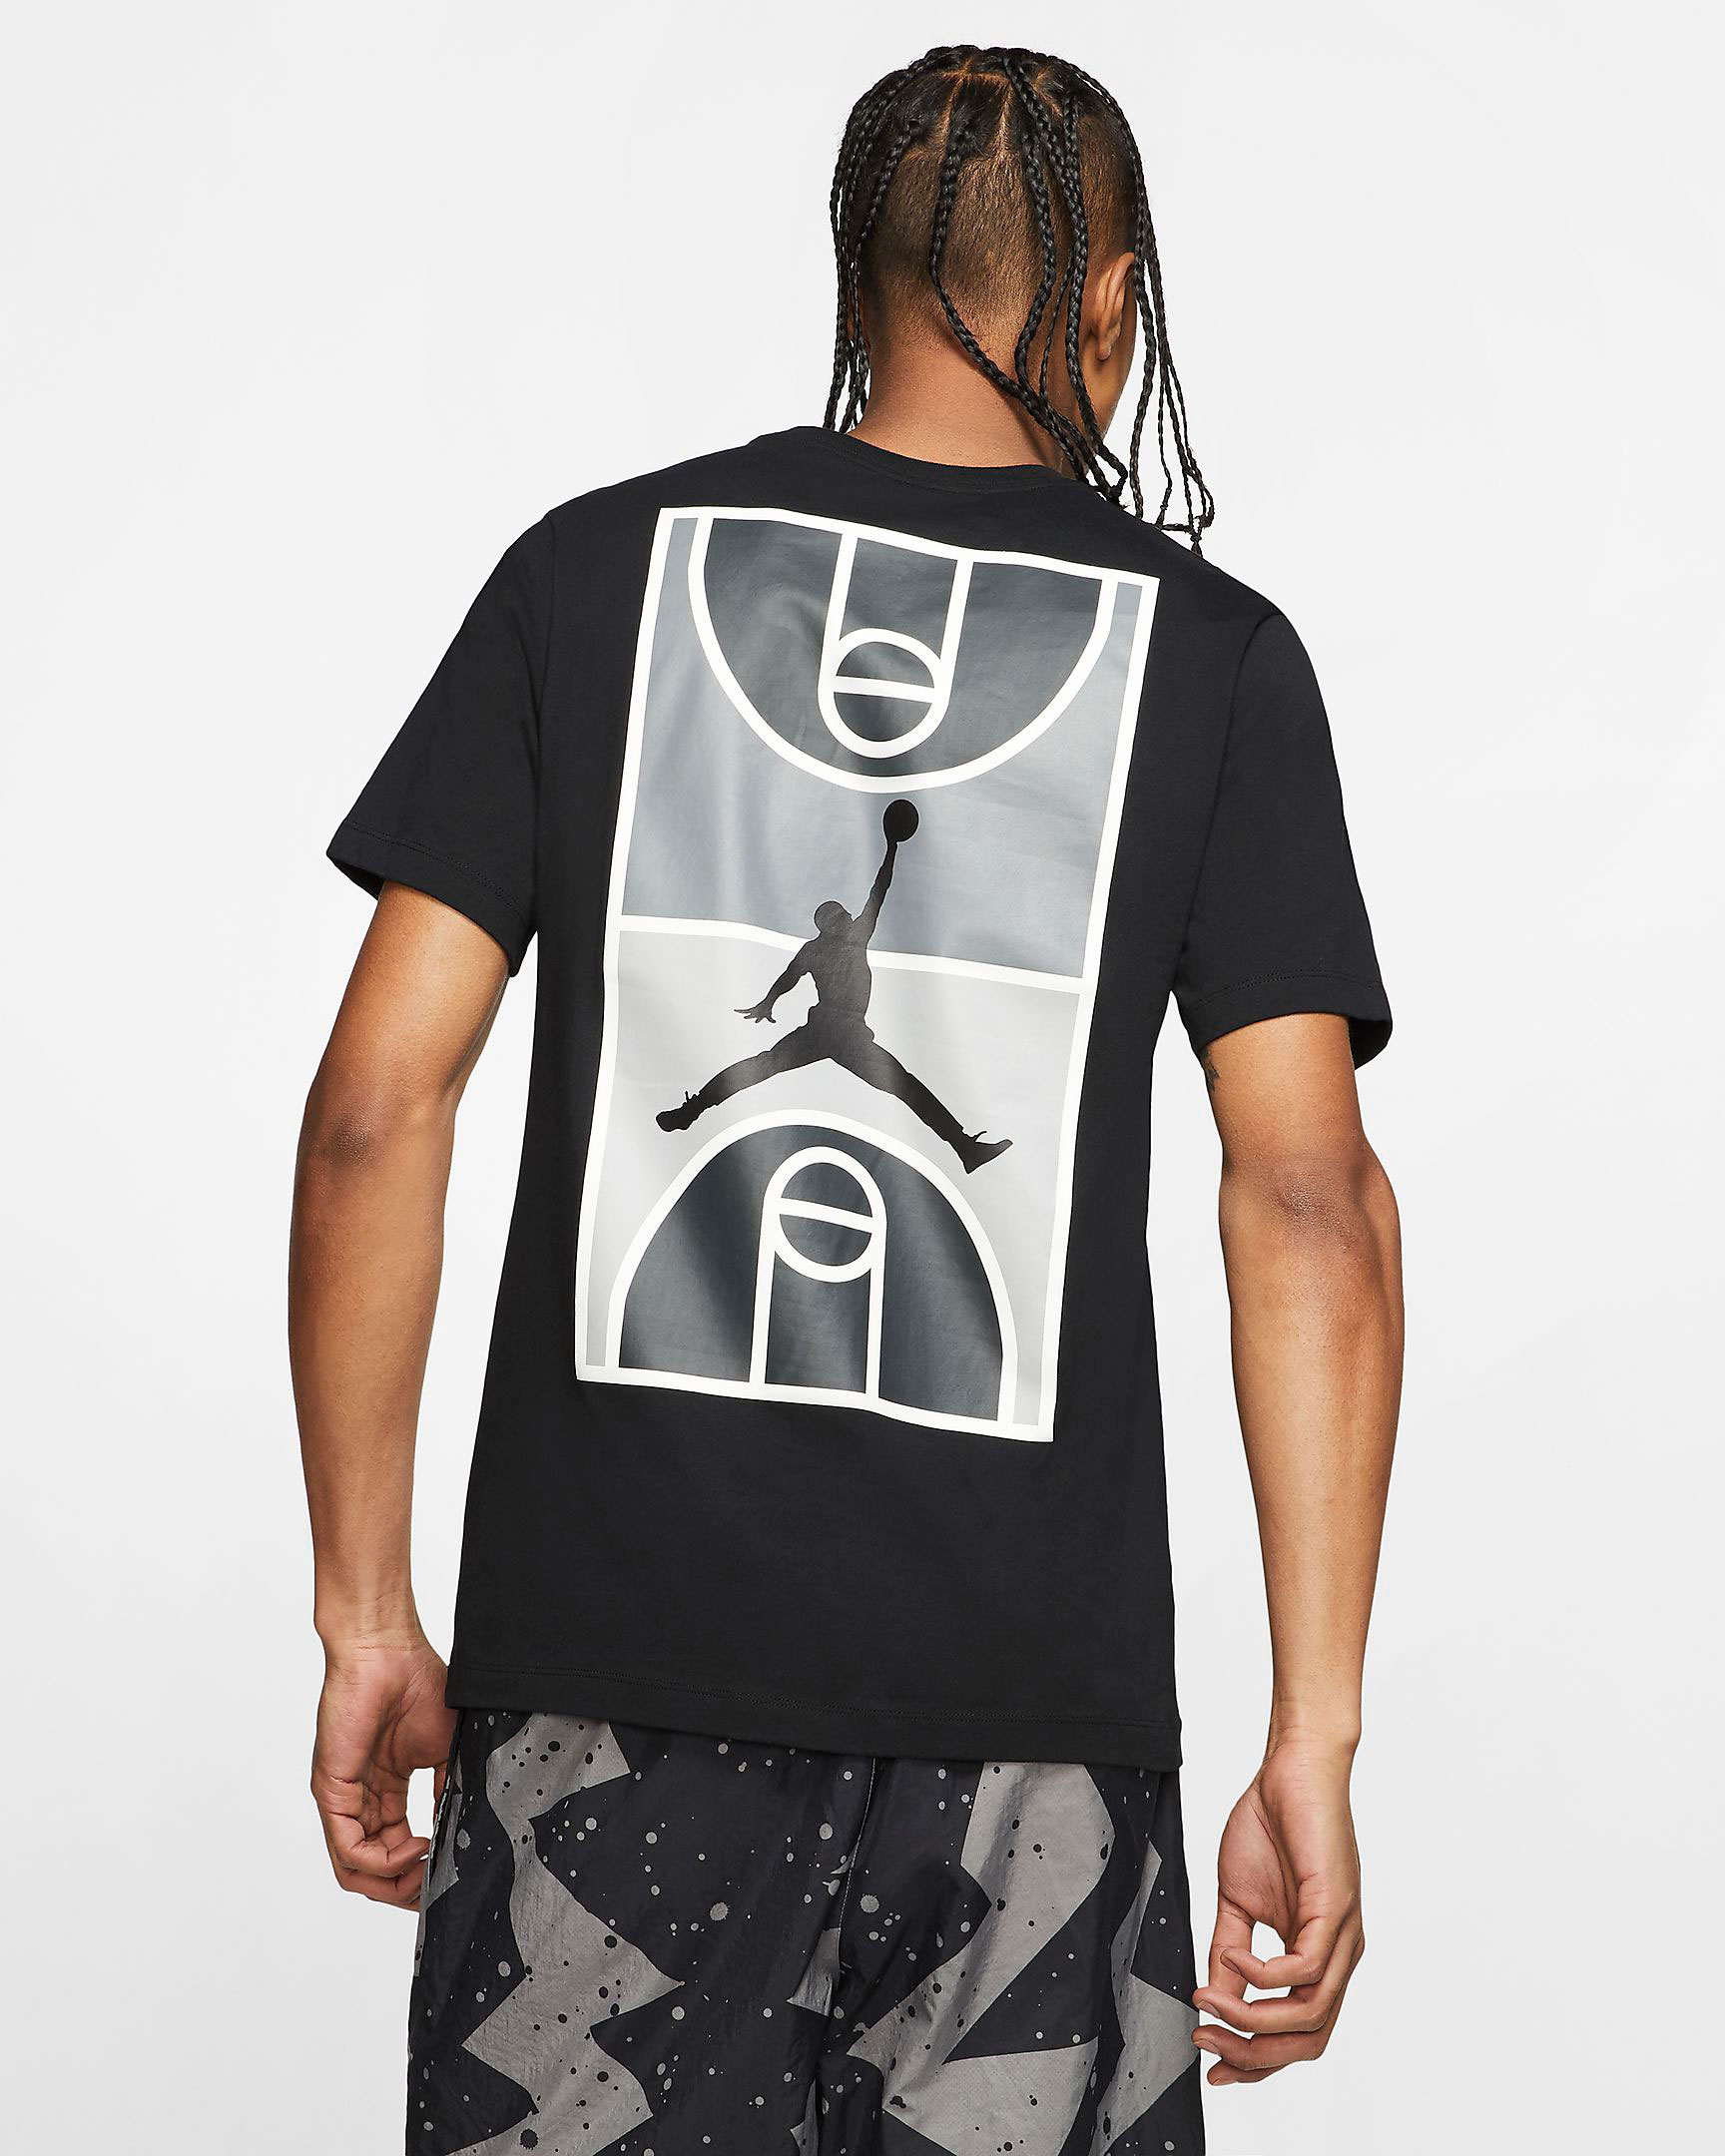 jordan-court-shirt-black-grey-2